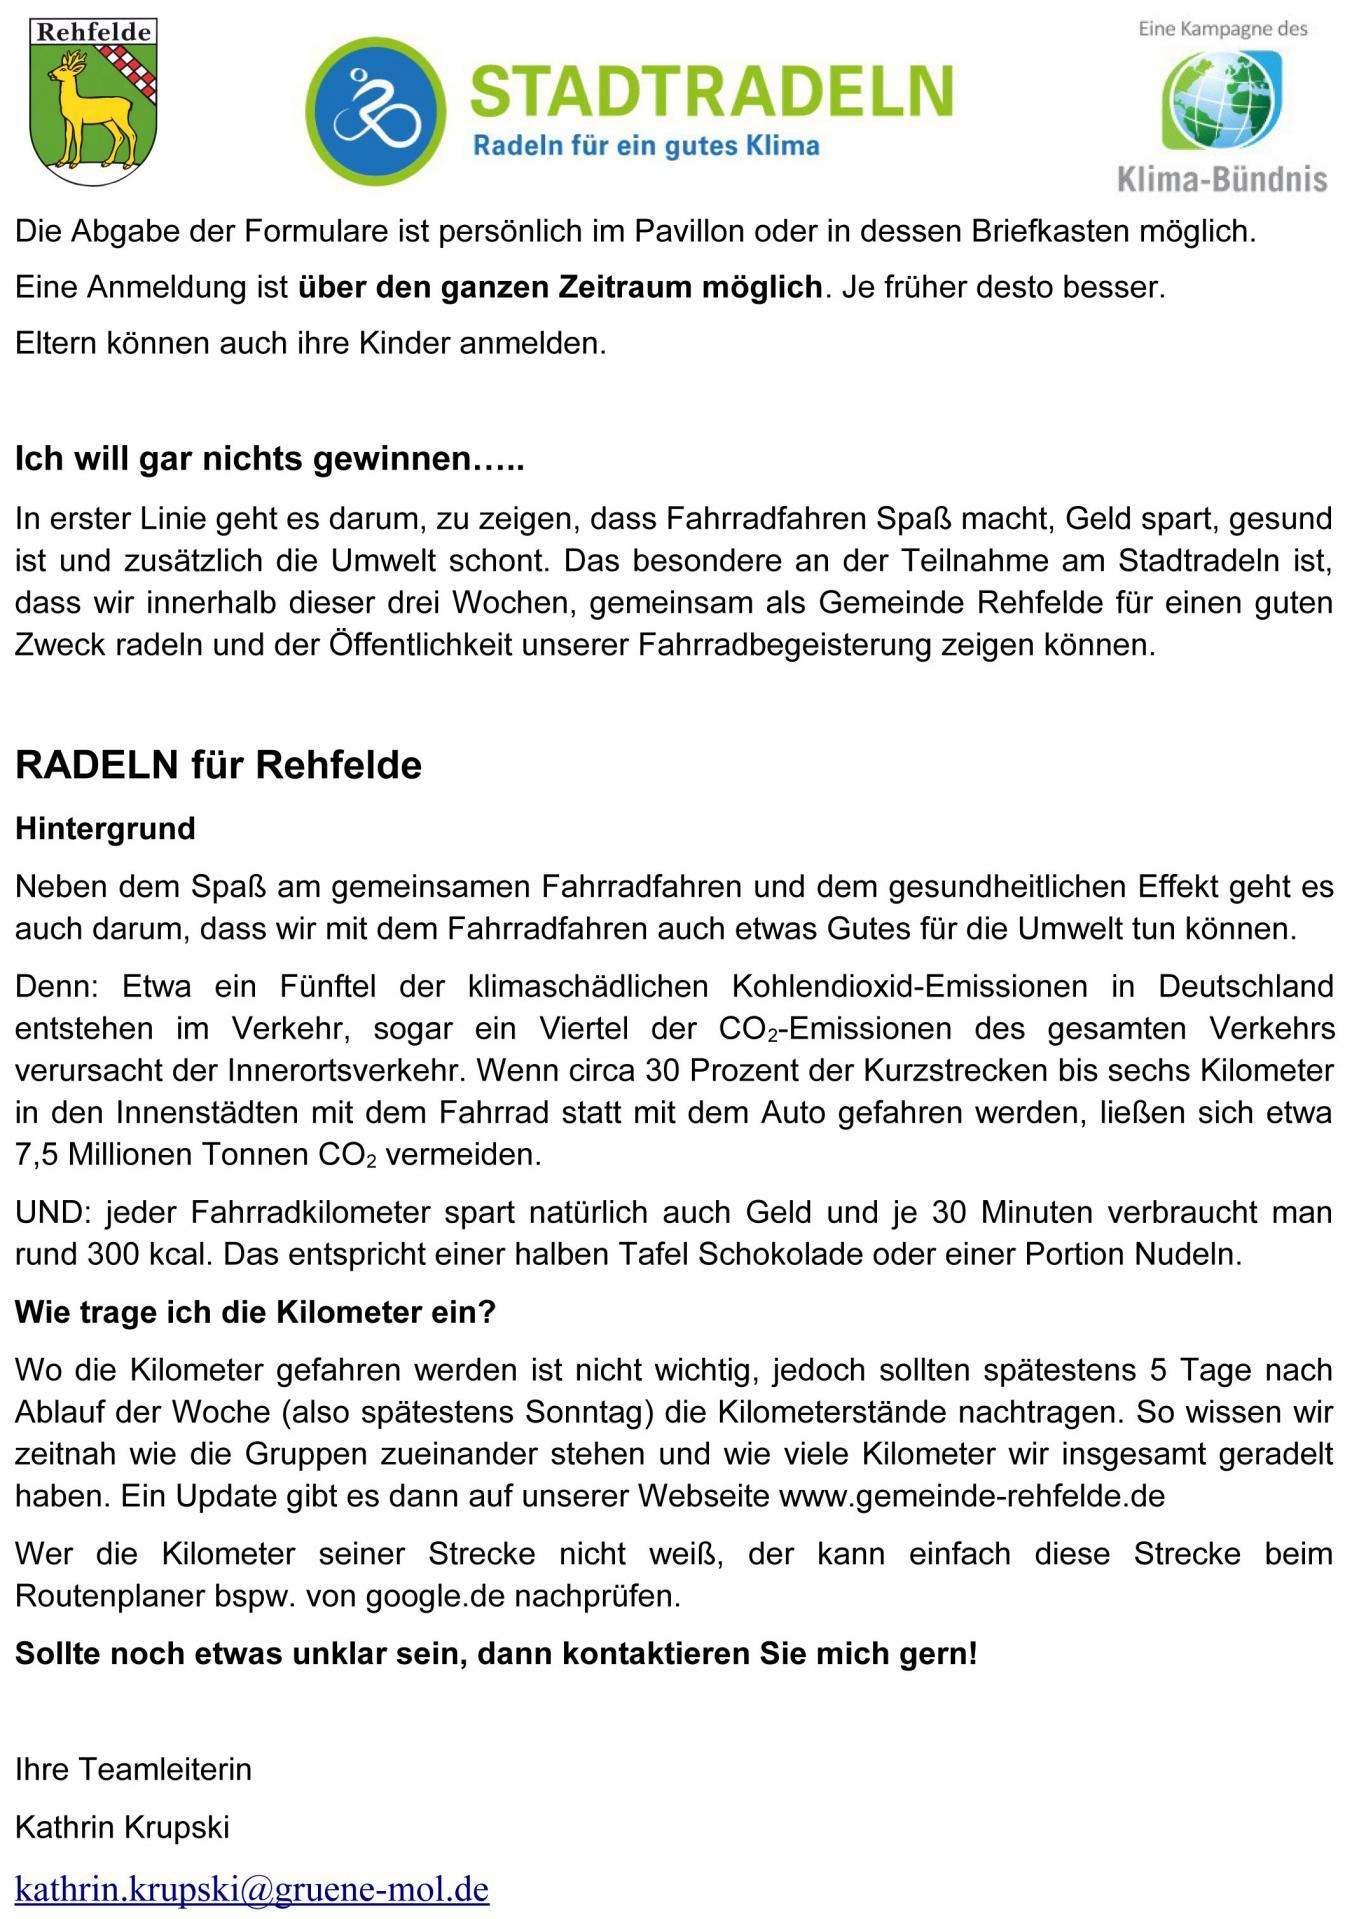 Stadtradeln_Radeln_fuer_Rehfelde_2021_2